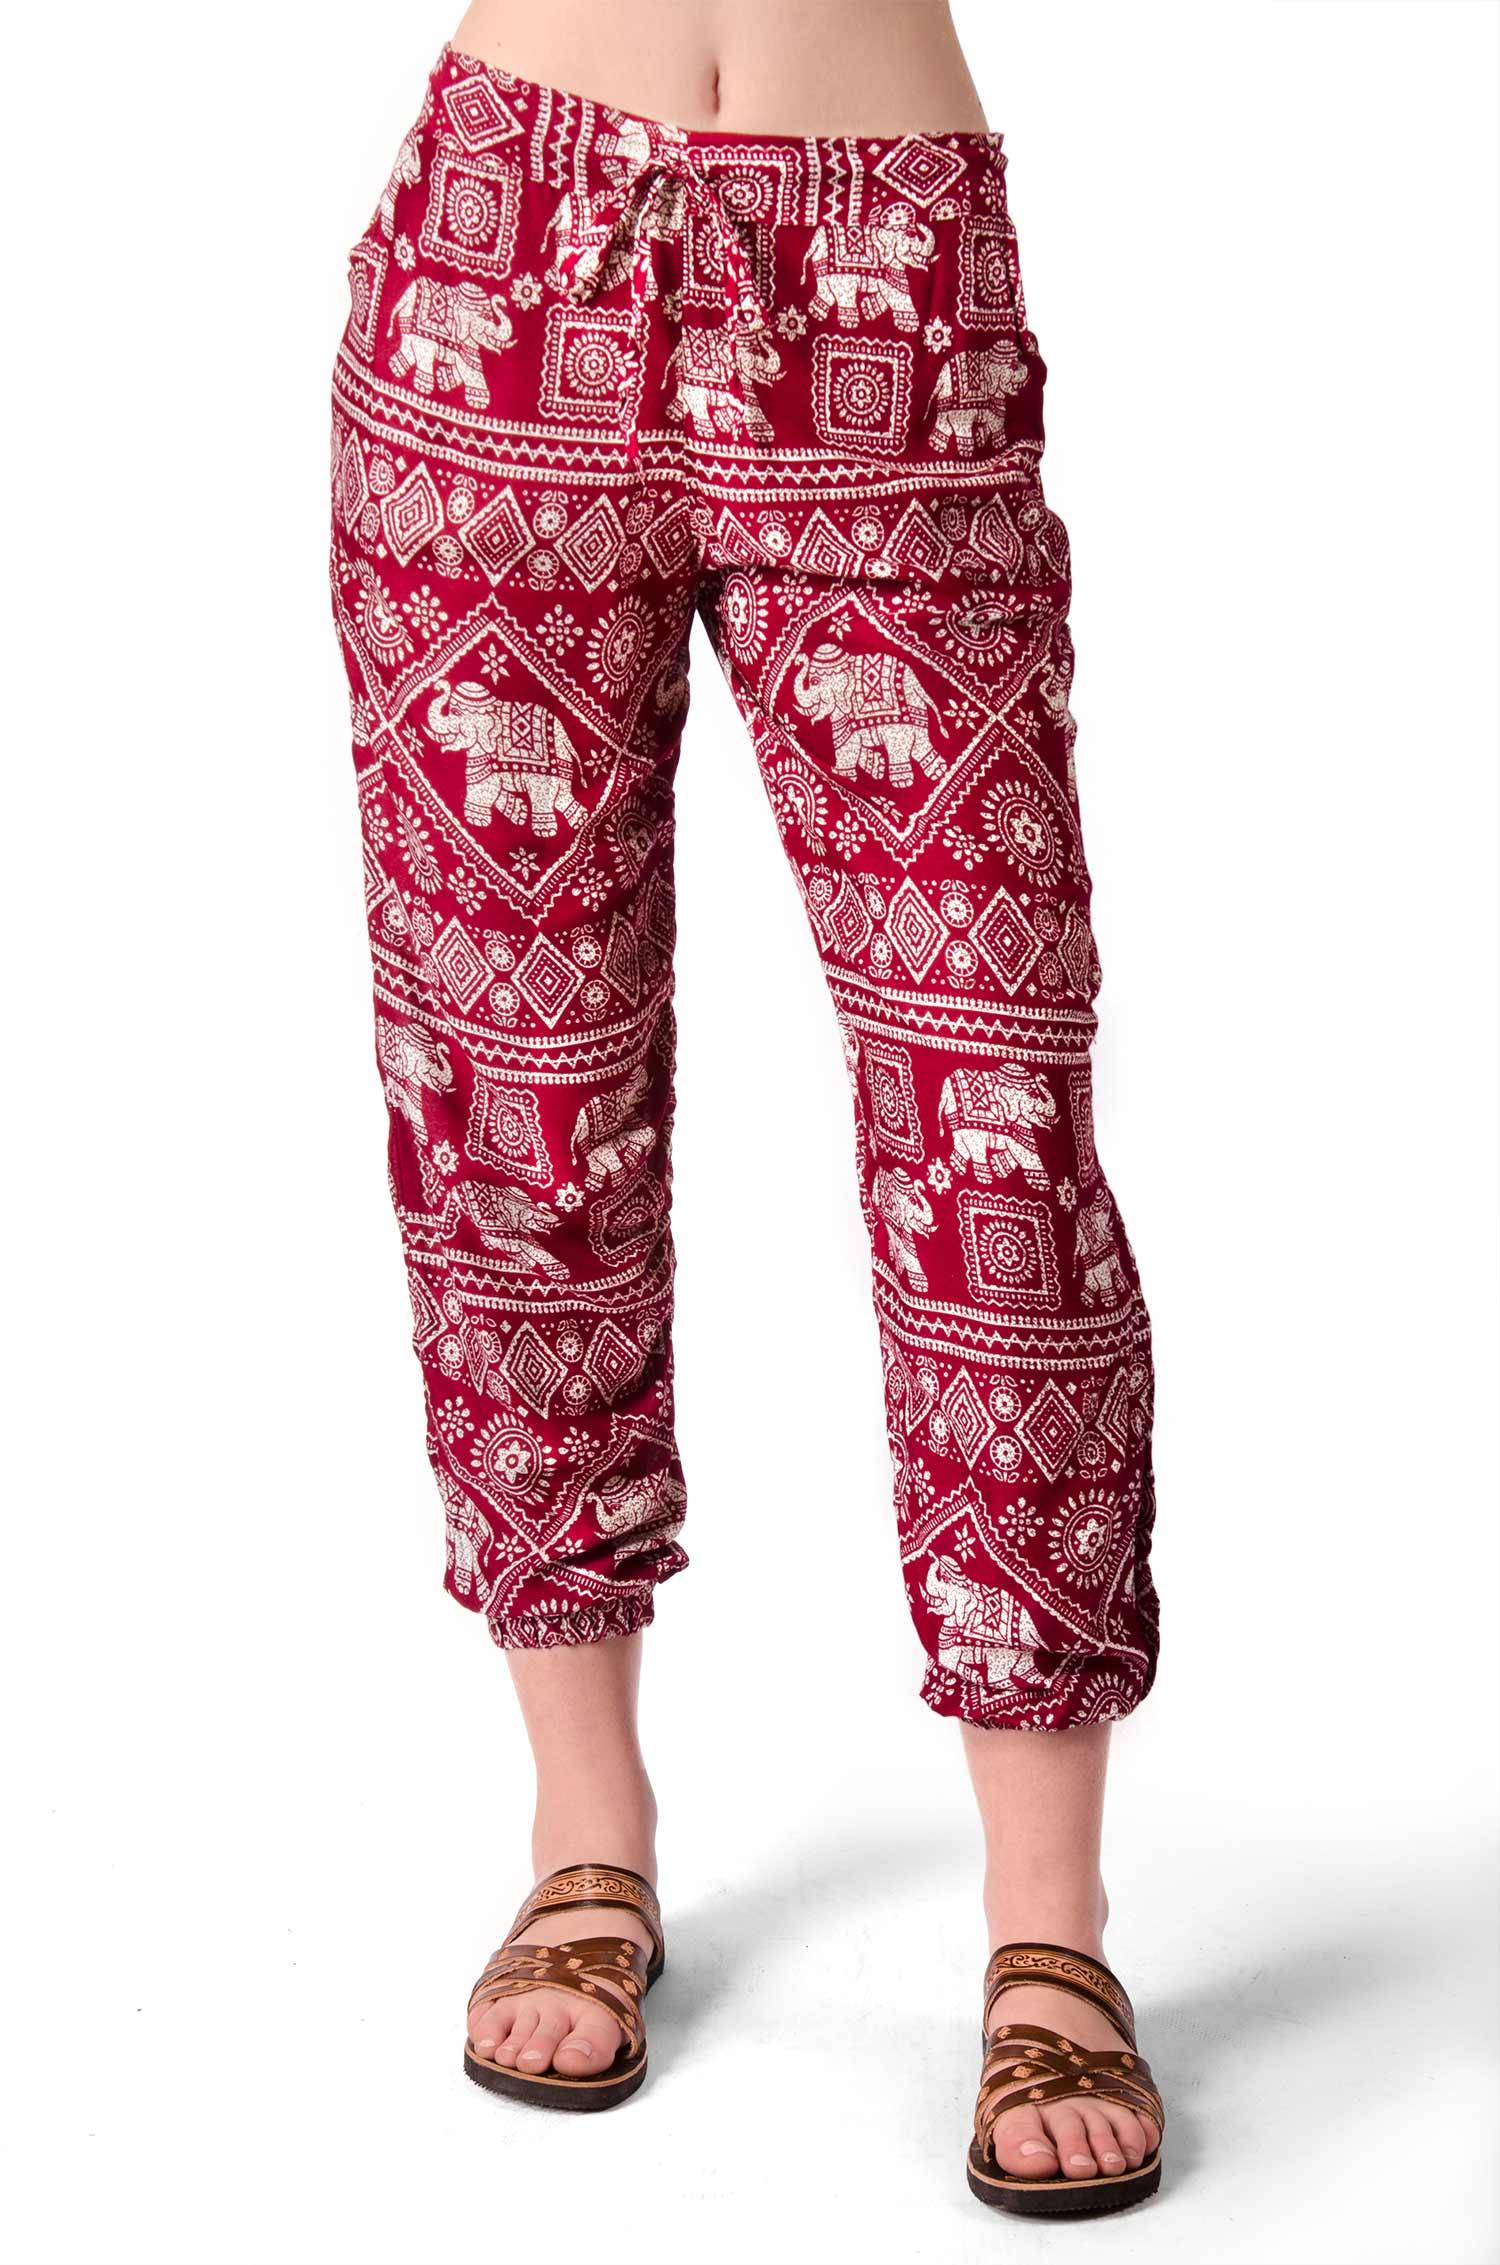 Elephant Print Capri Pants - Red - 4473R